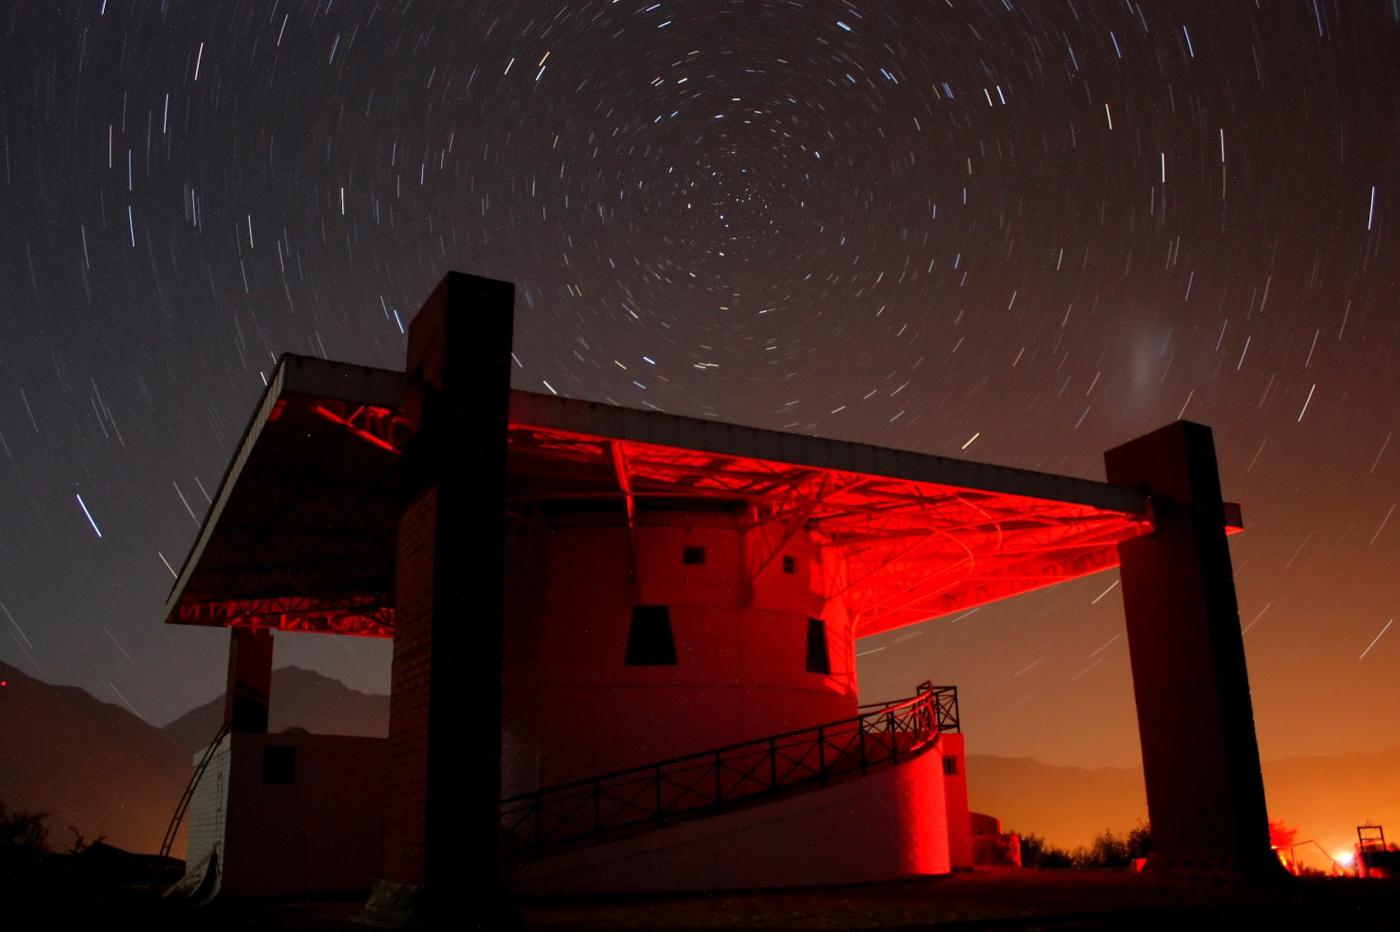 chi07-mamalluca-observatory-free-turismochile